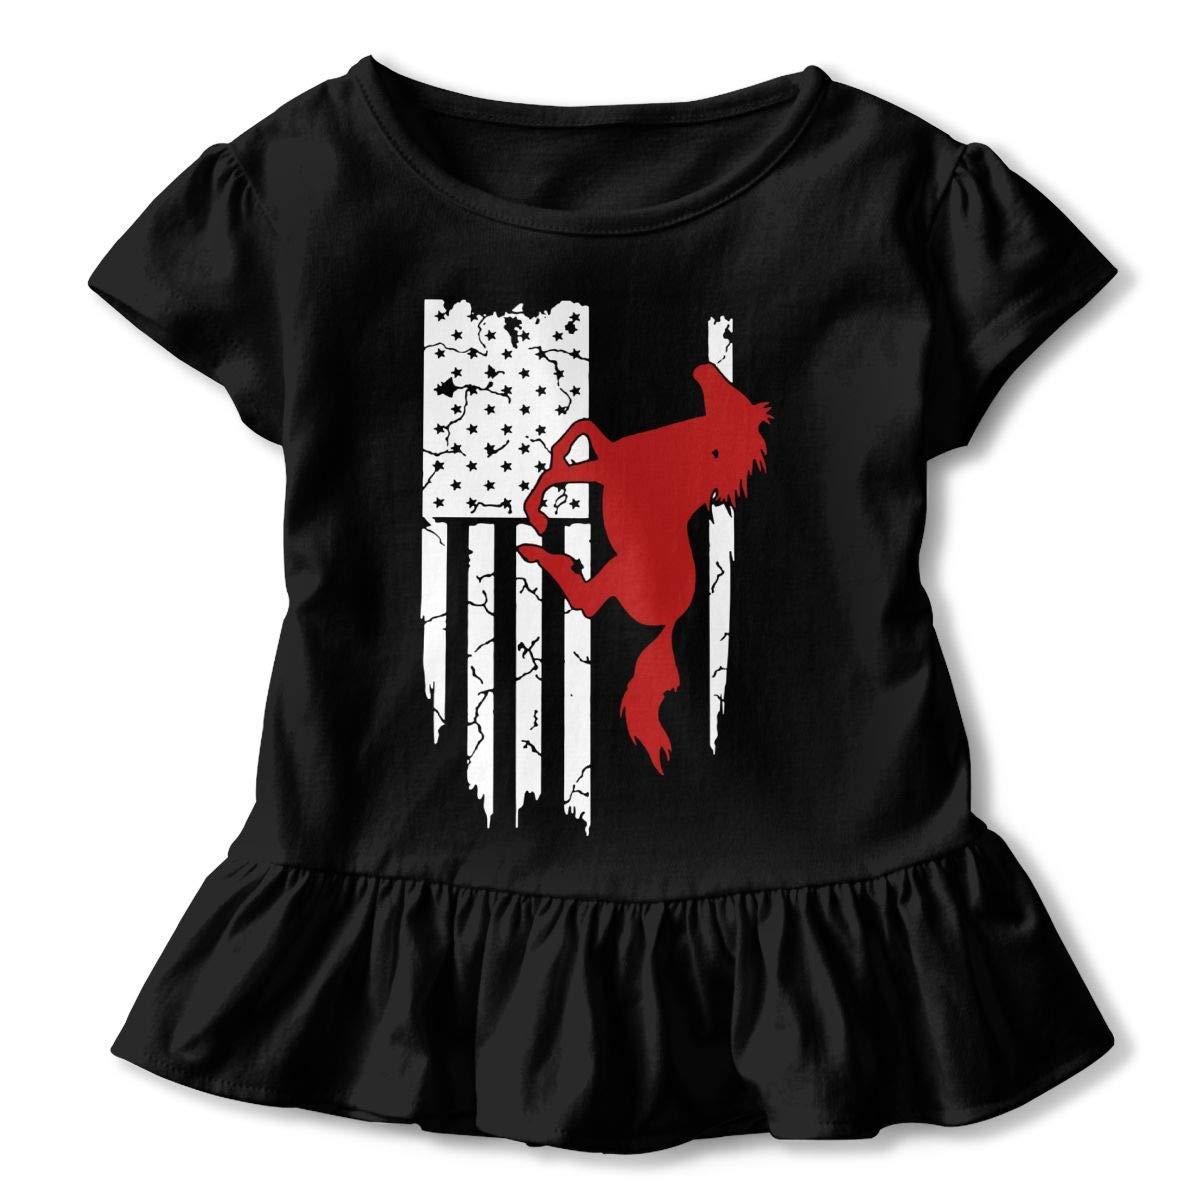 2-Pack Cotton Tee Horse American Flag Baby Girls Short Sleeve Ruffles T-Shirt Tops